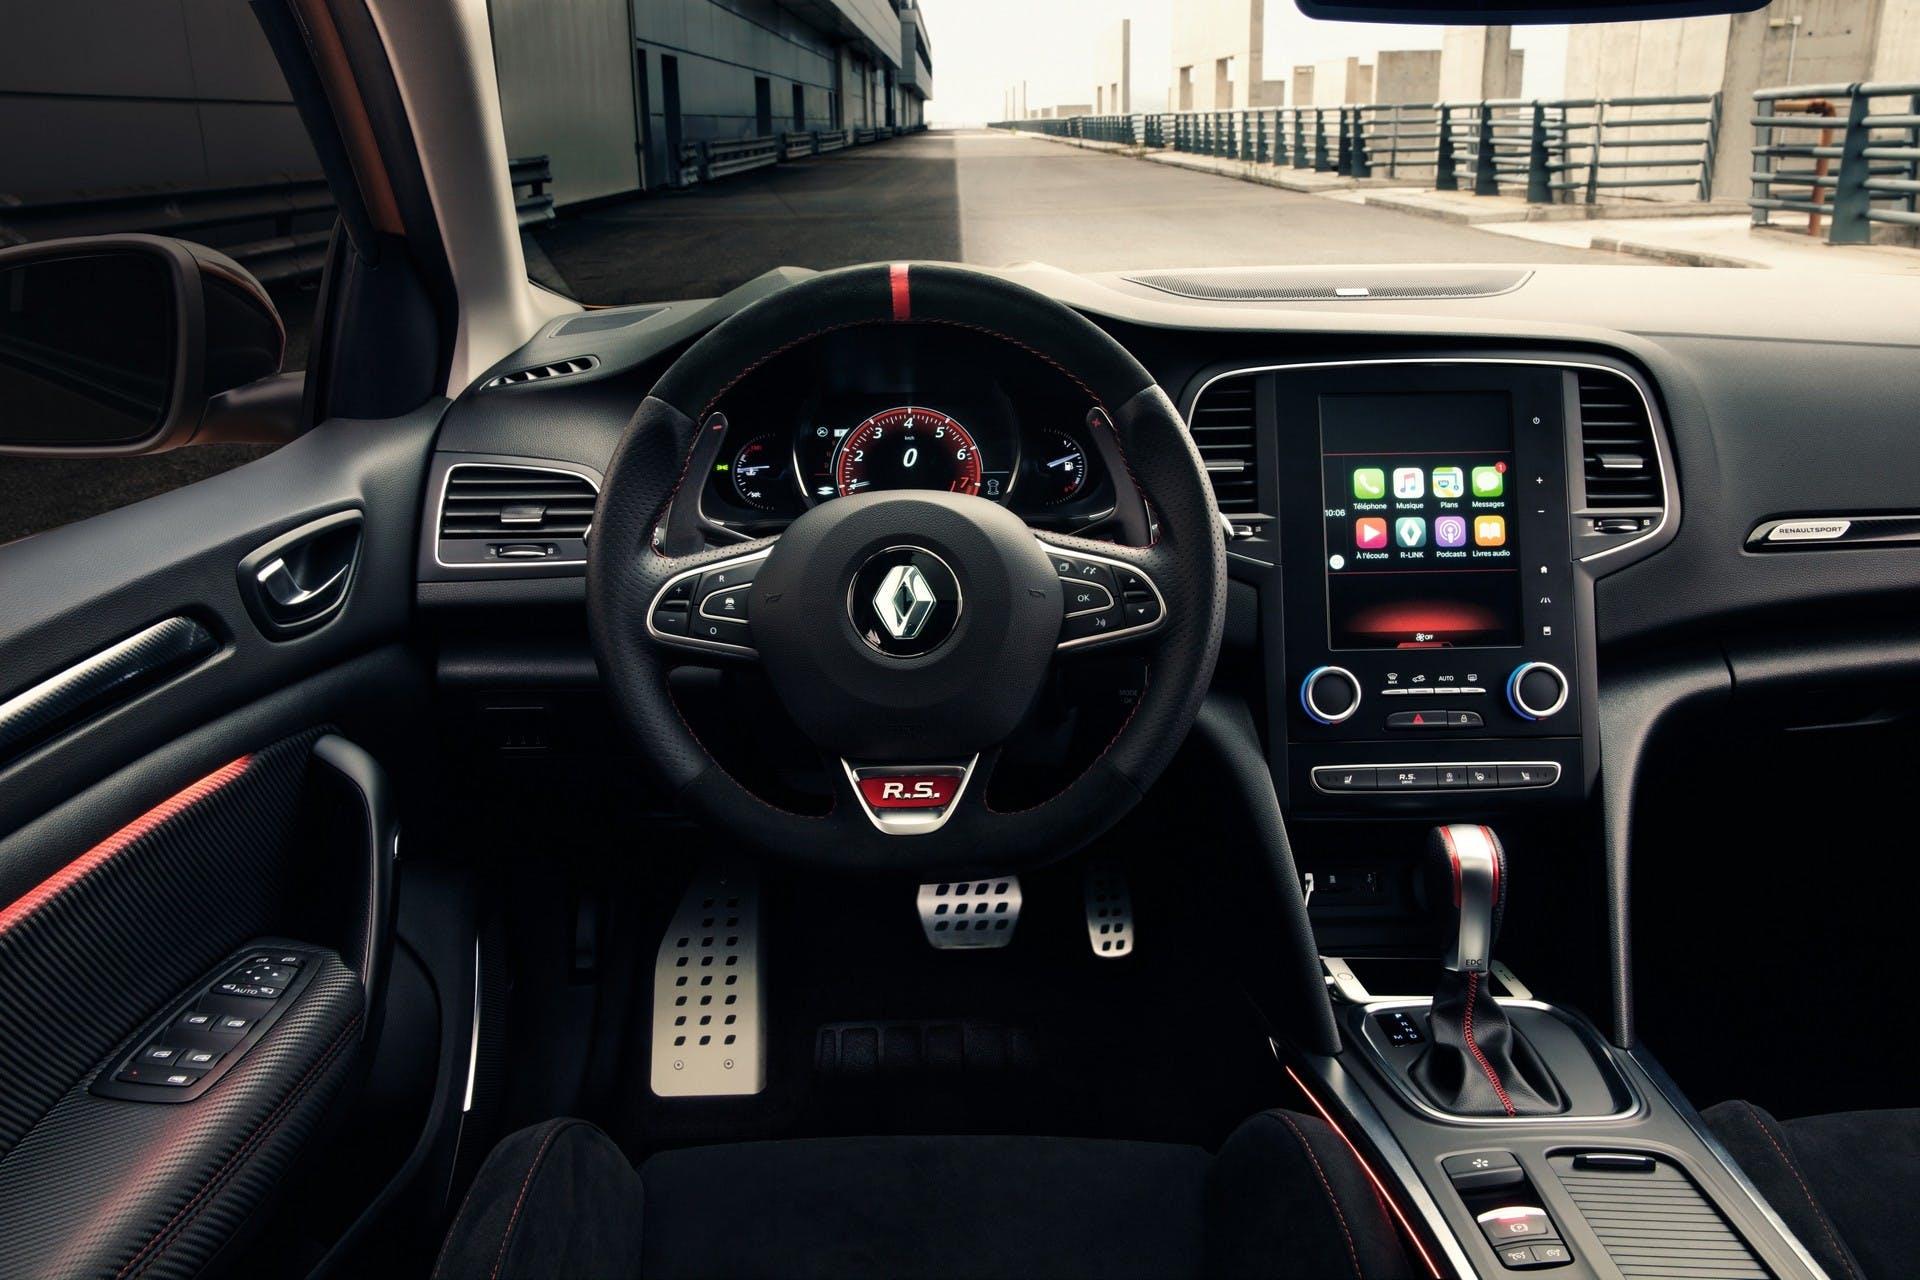 Renault Mégane RS 2018 interni